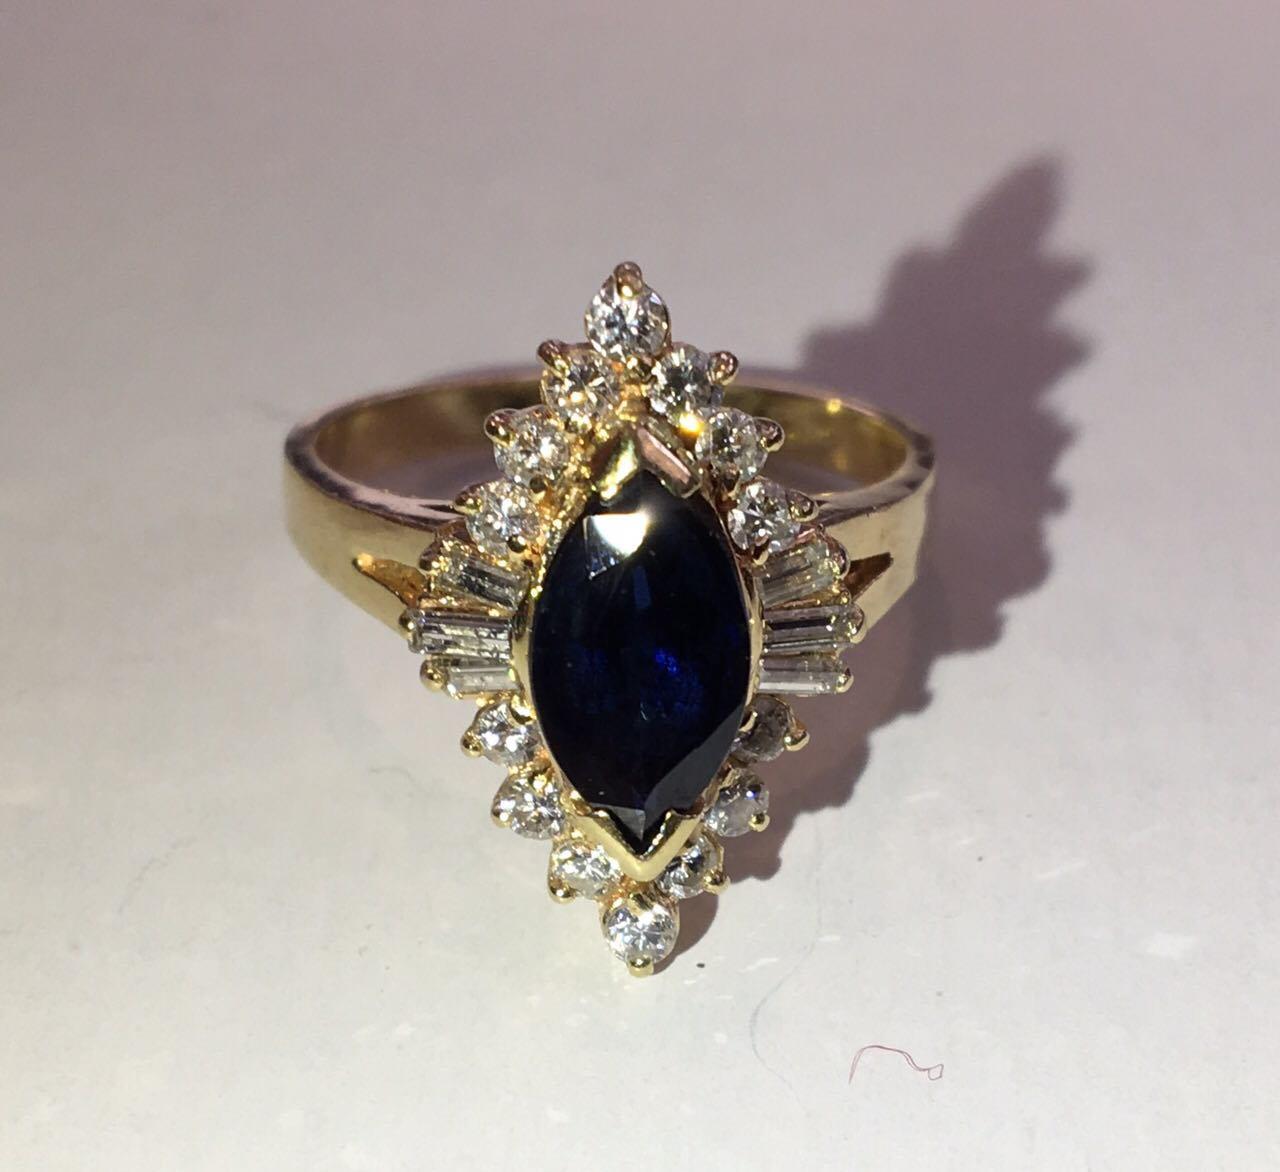 7e6b3e0c663b Золотое кольцо 585 проба ,сапфир и бриллианты. Размер 18 Сертификат ...